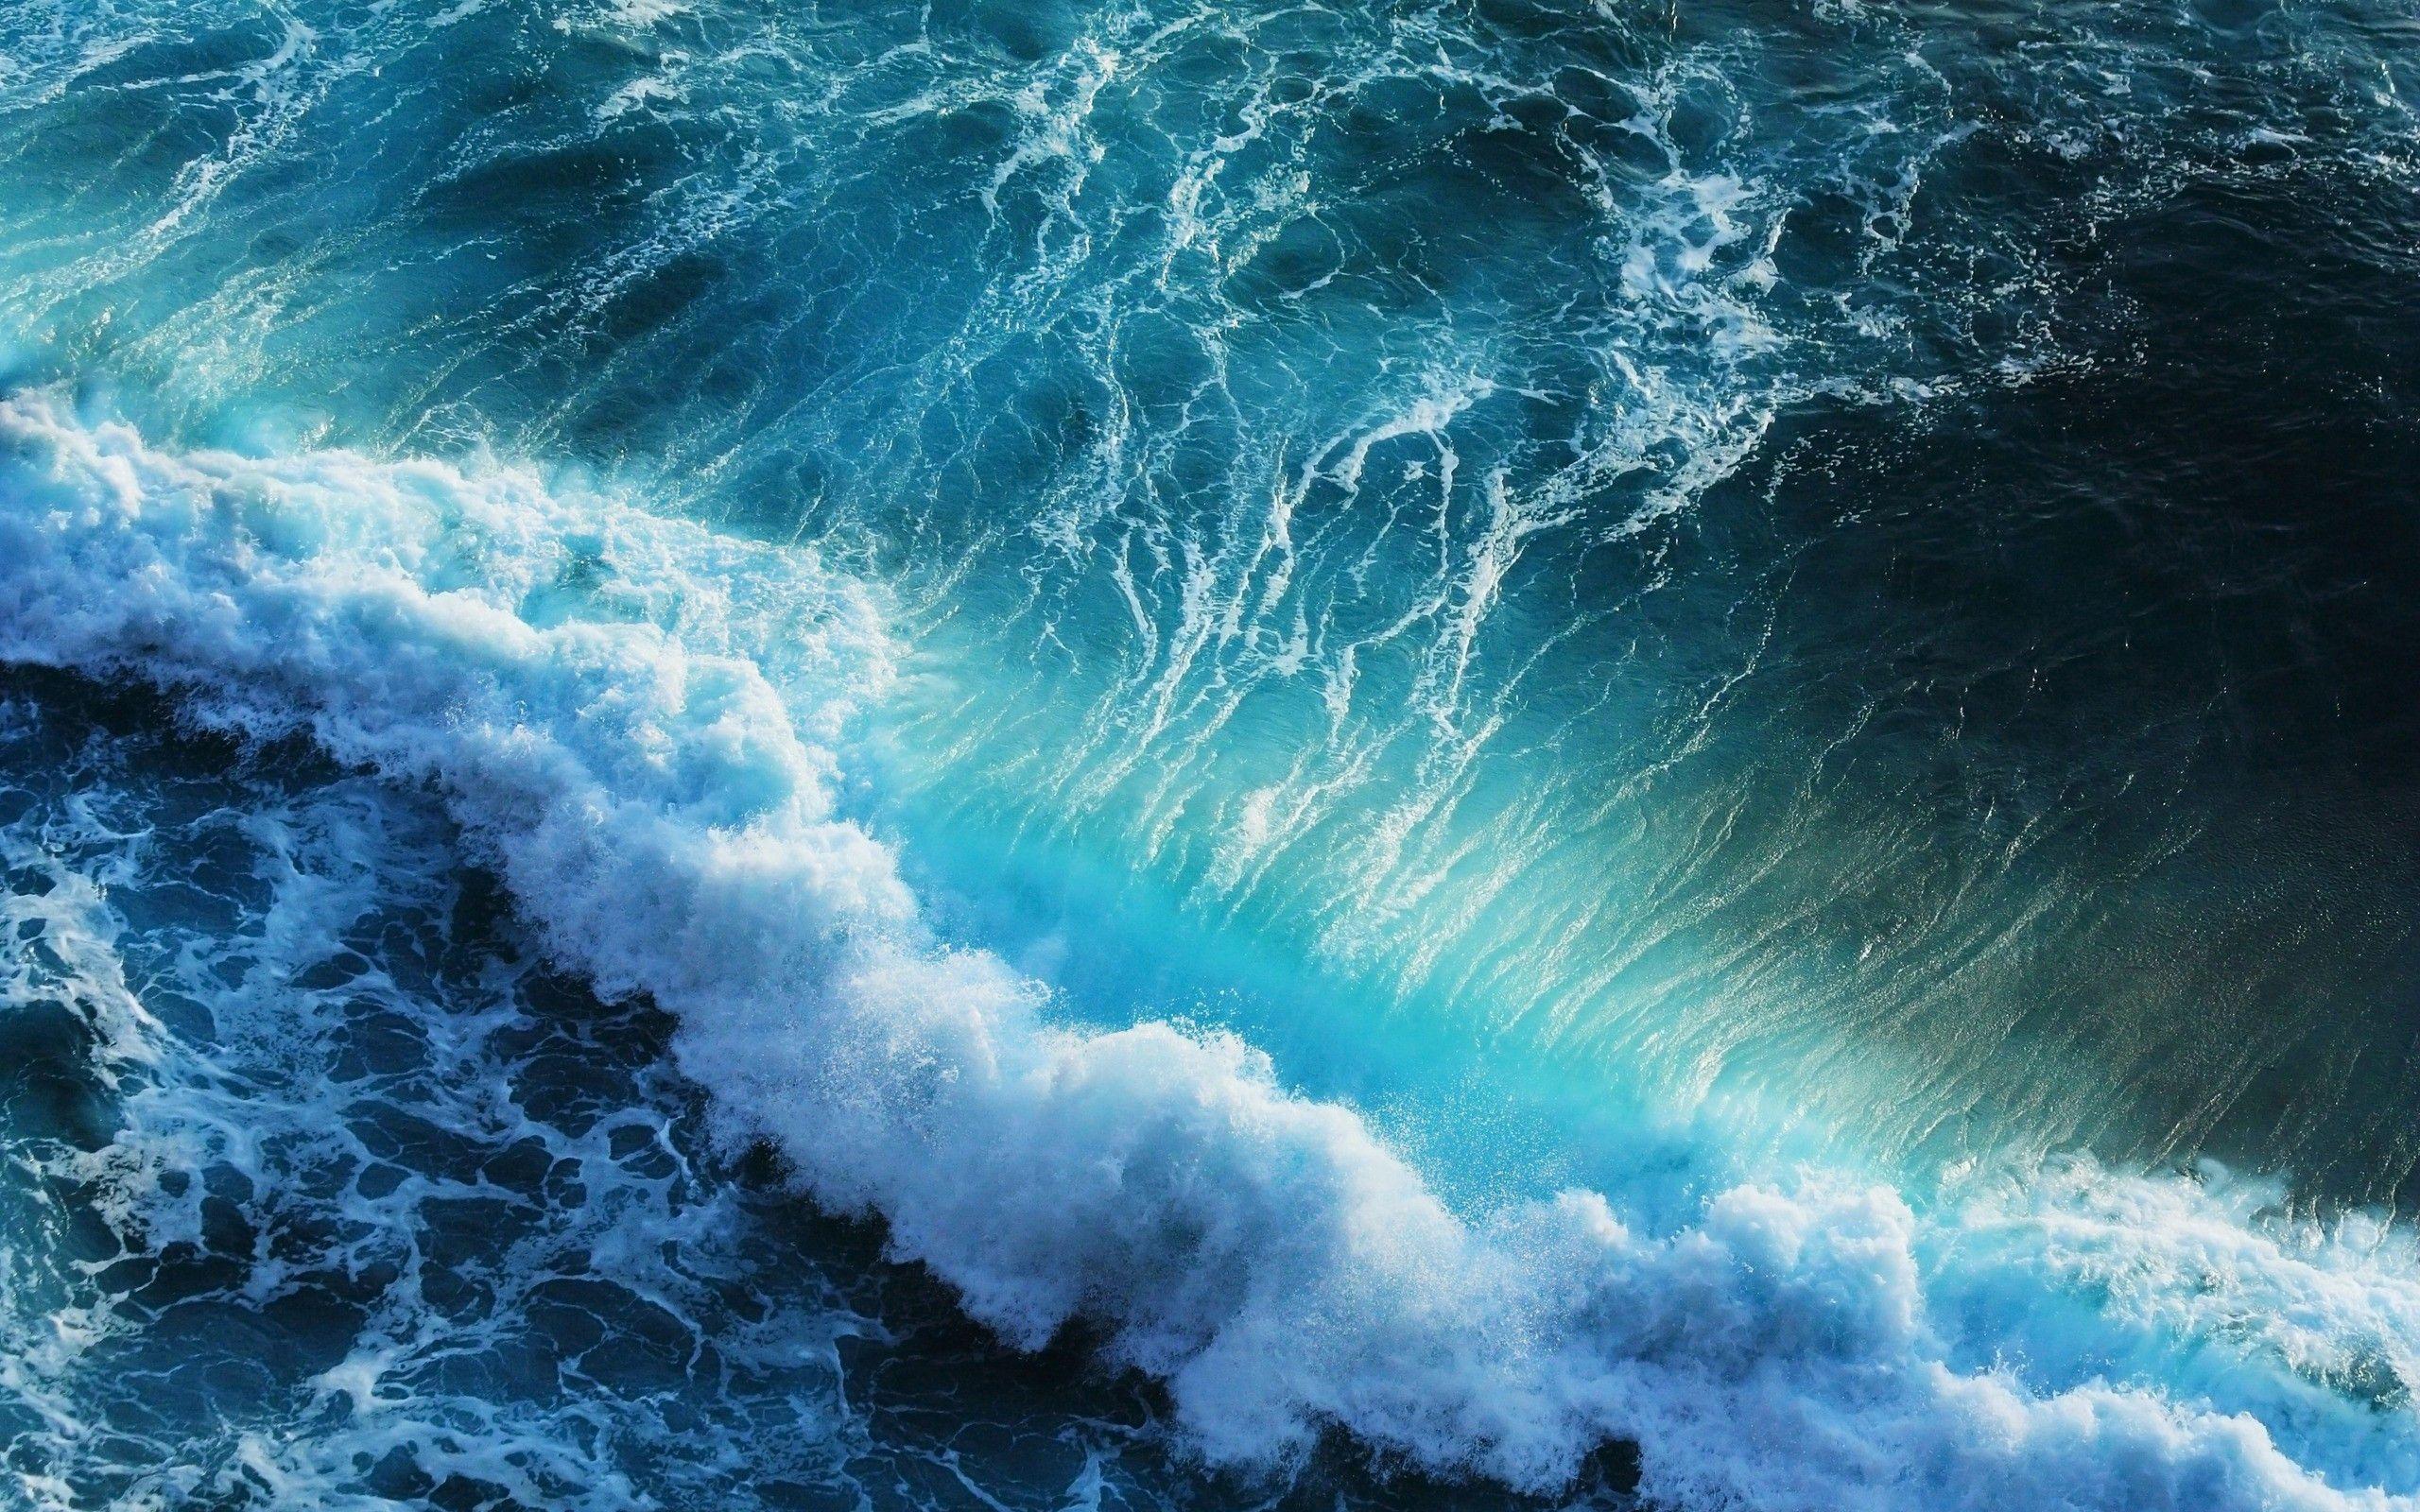 3840x2160 Ocean 4k Download Hd Wallpaper For Desktop Sunrise Wallpaper Beach Sunset Wallpaper Beach Wallpaper